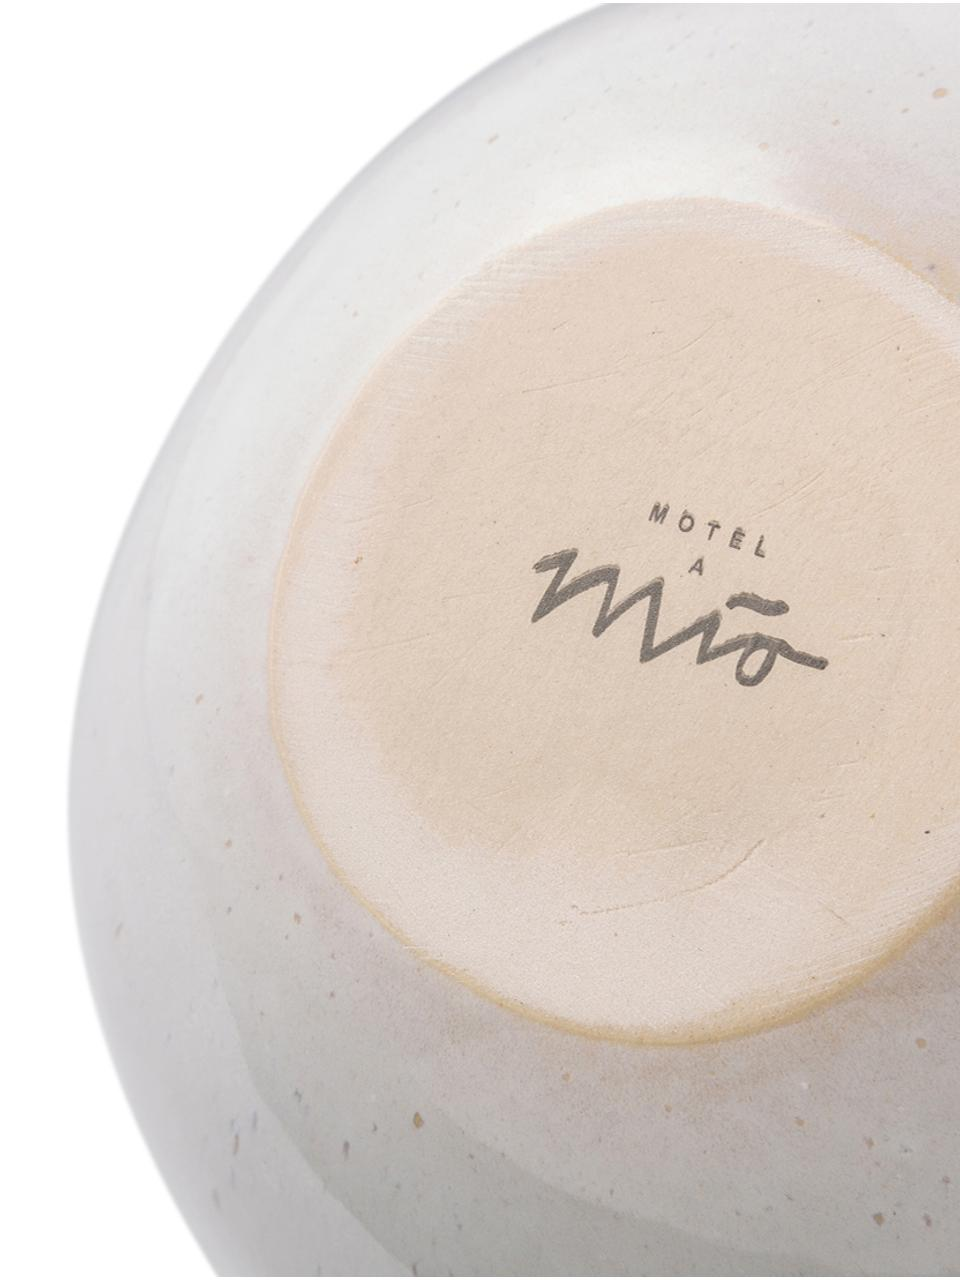 Ciotola dipinta a mano Areia 2 pz, Terracotta, Menta, bianco latteo, beige, Ø 15 x Alt. 8 cm